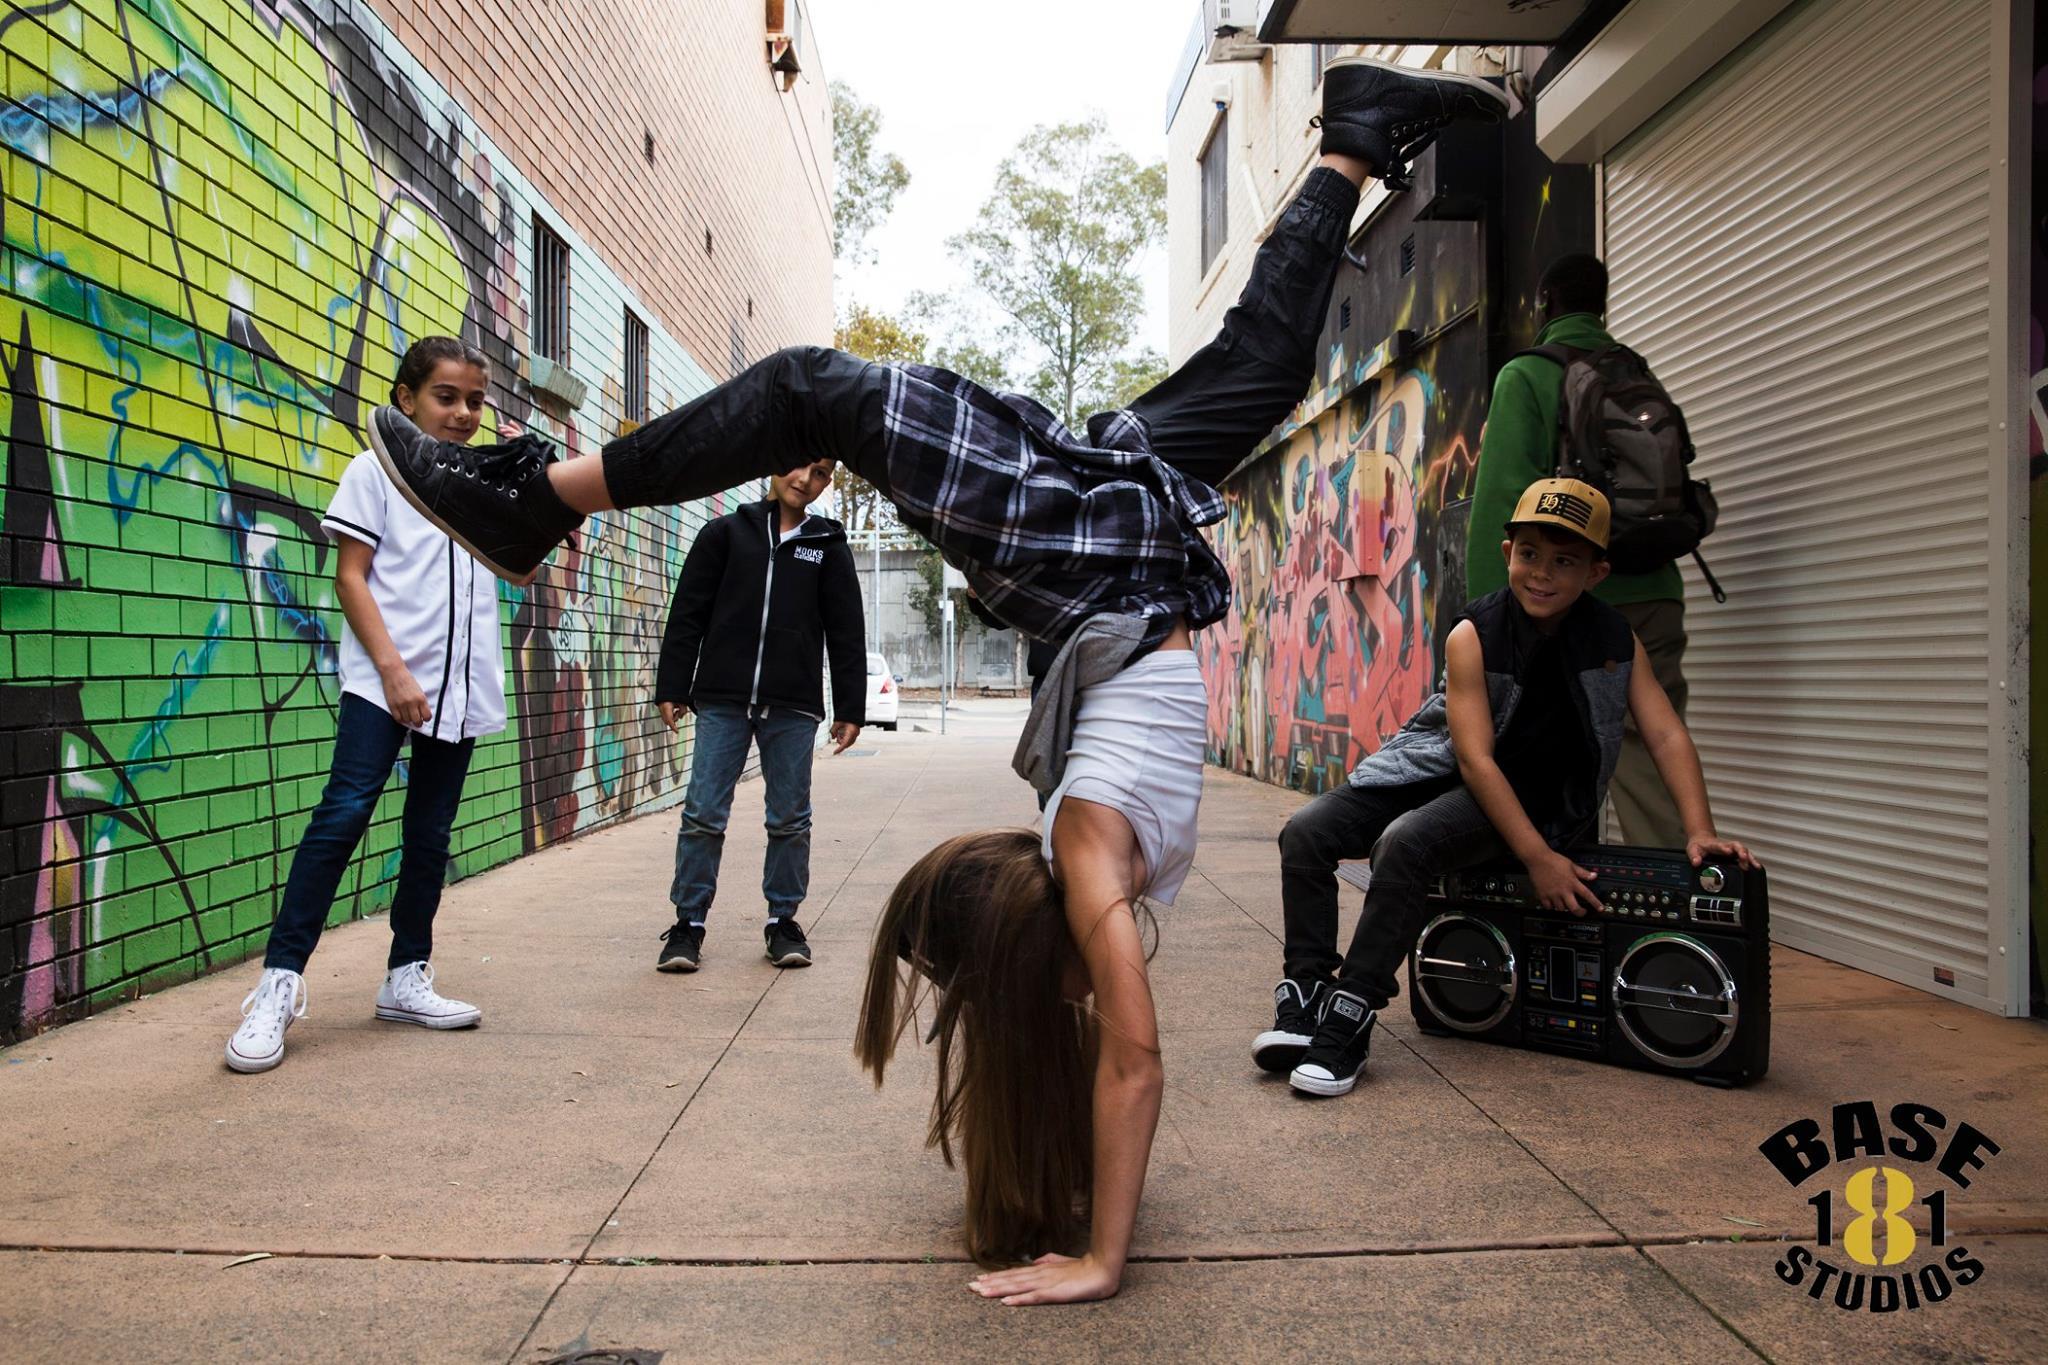 Base Dance Crew